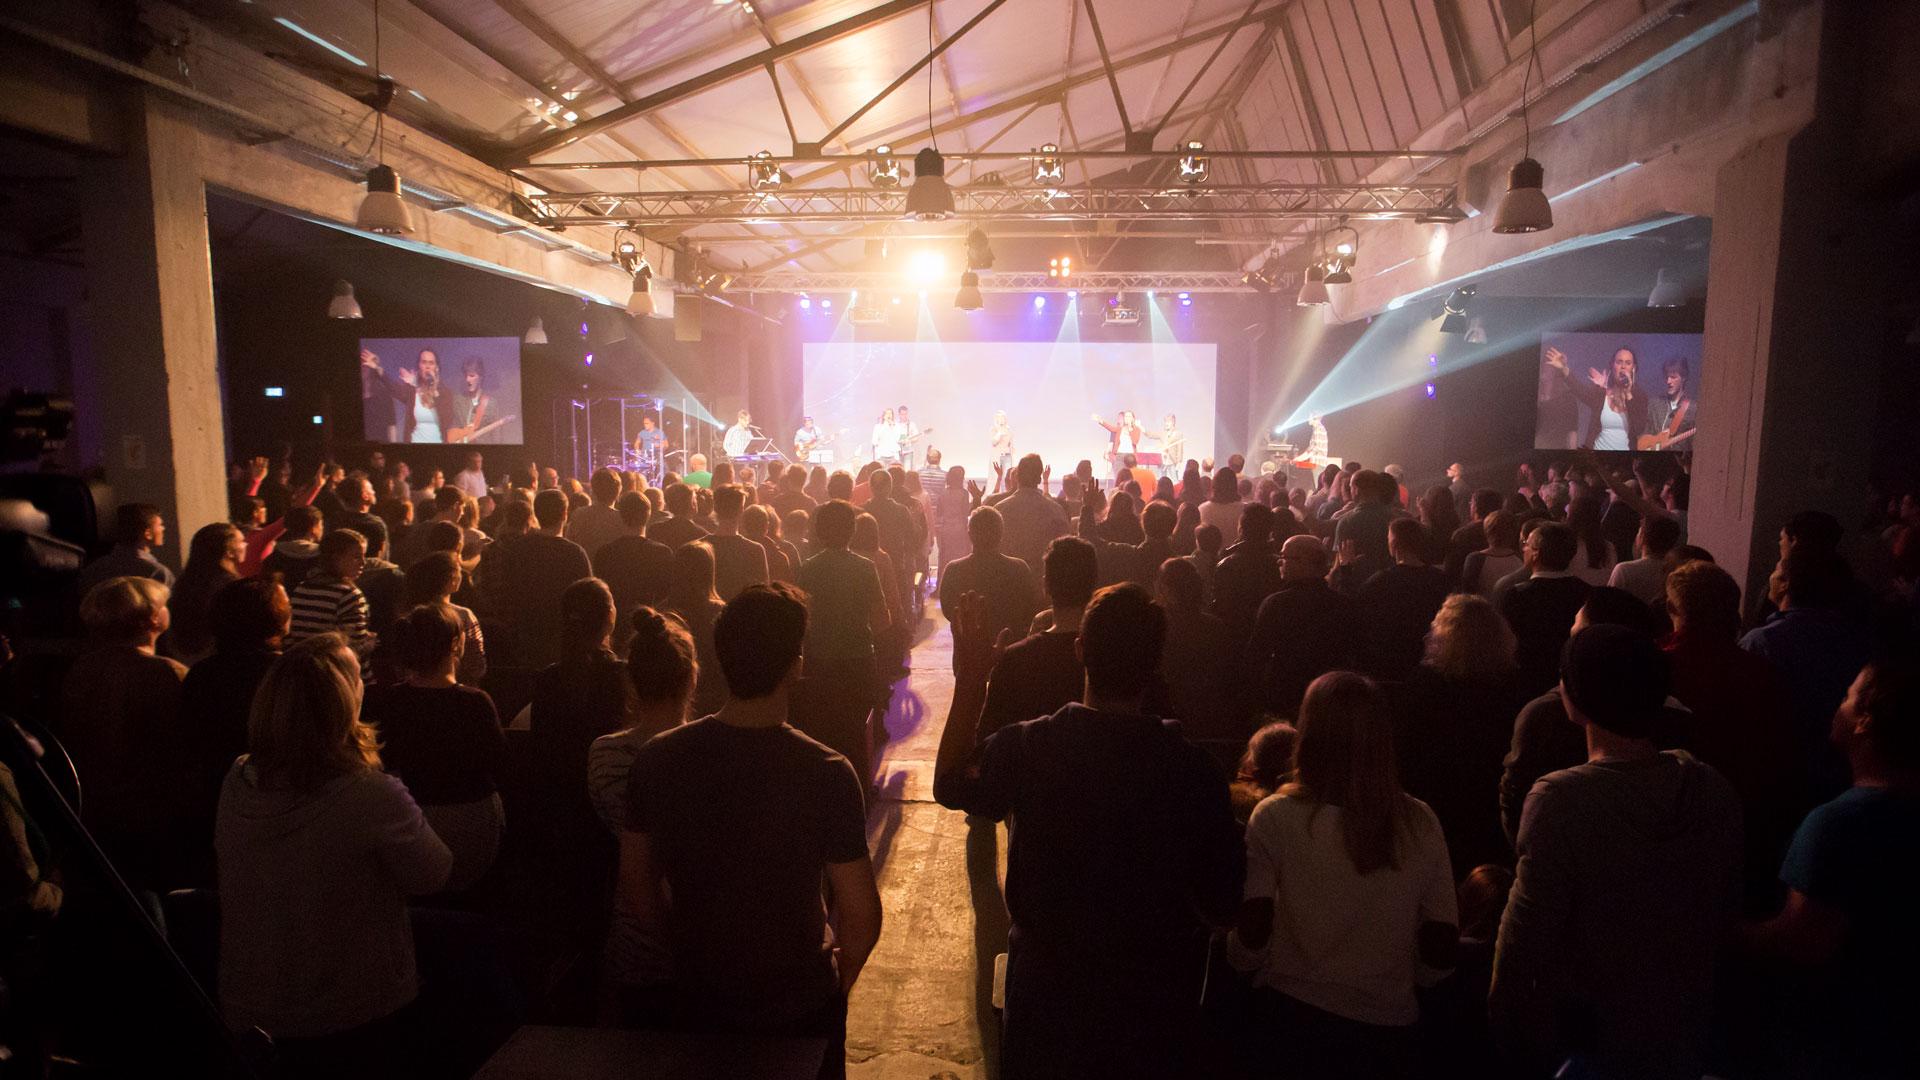 icf karlsruhe single event)